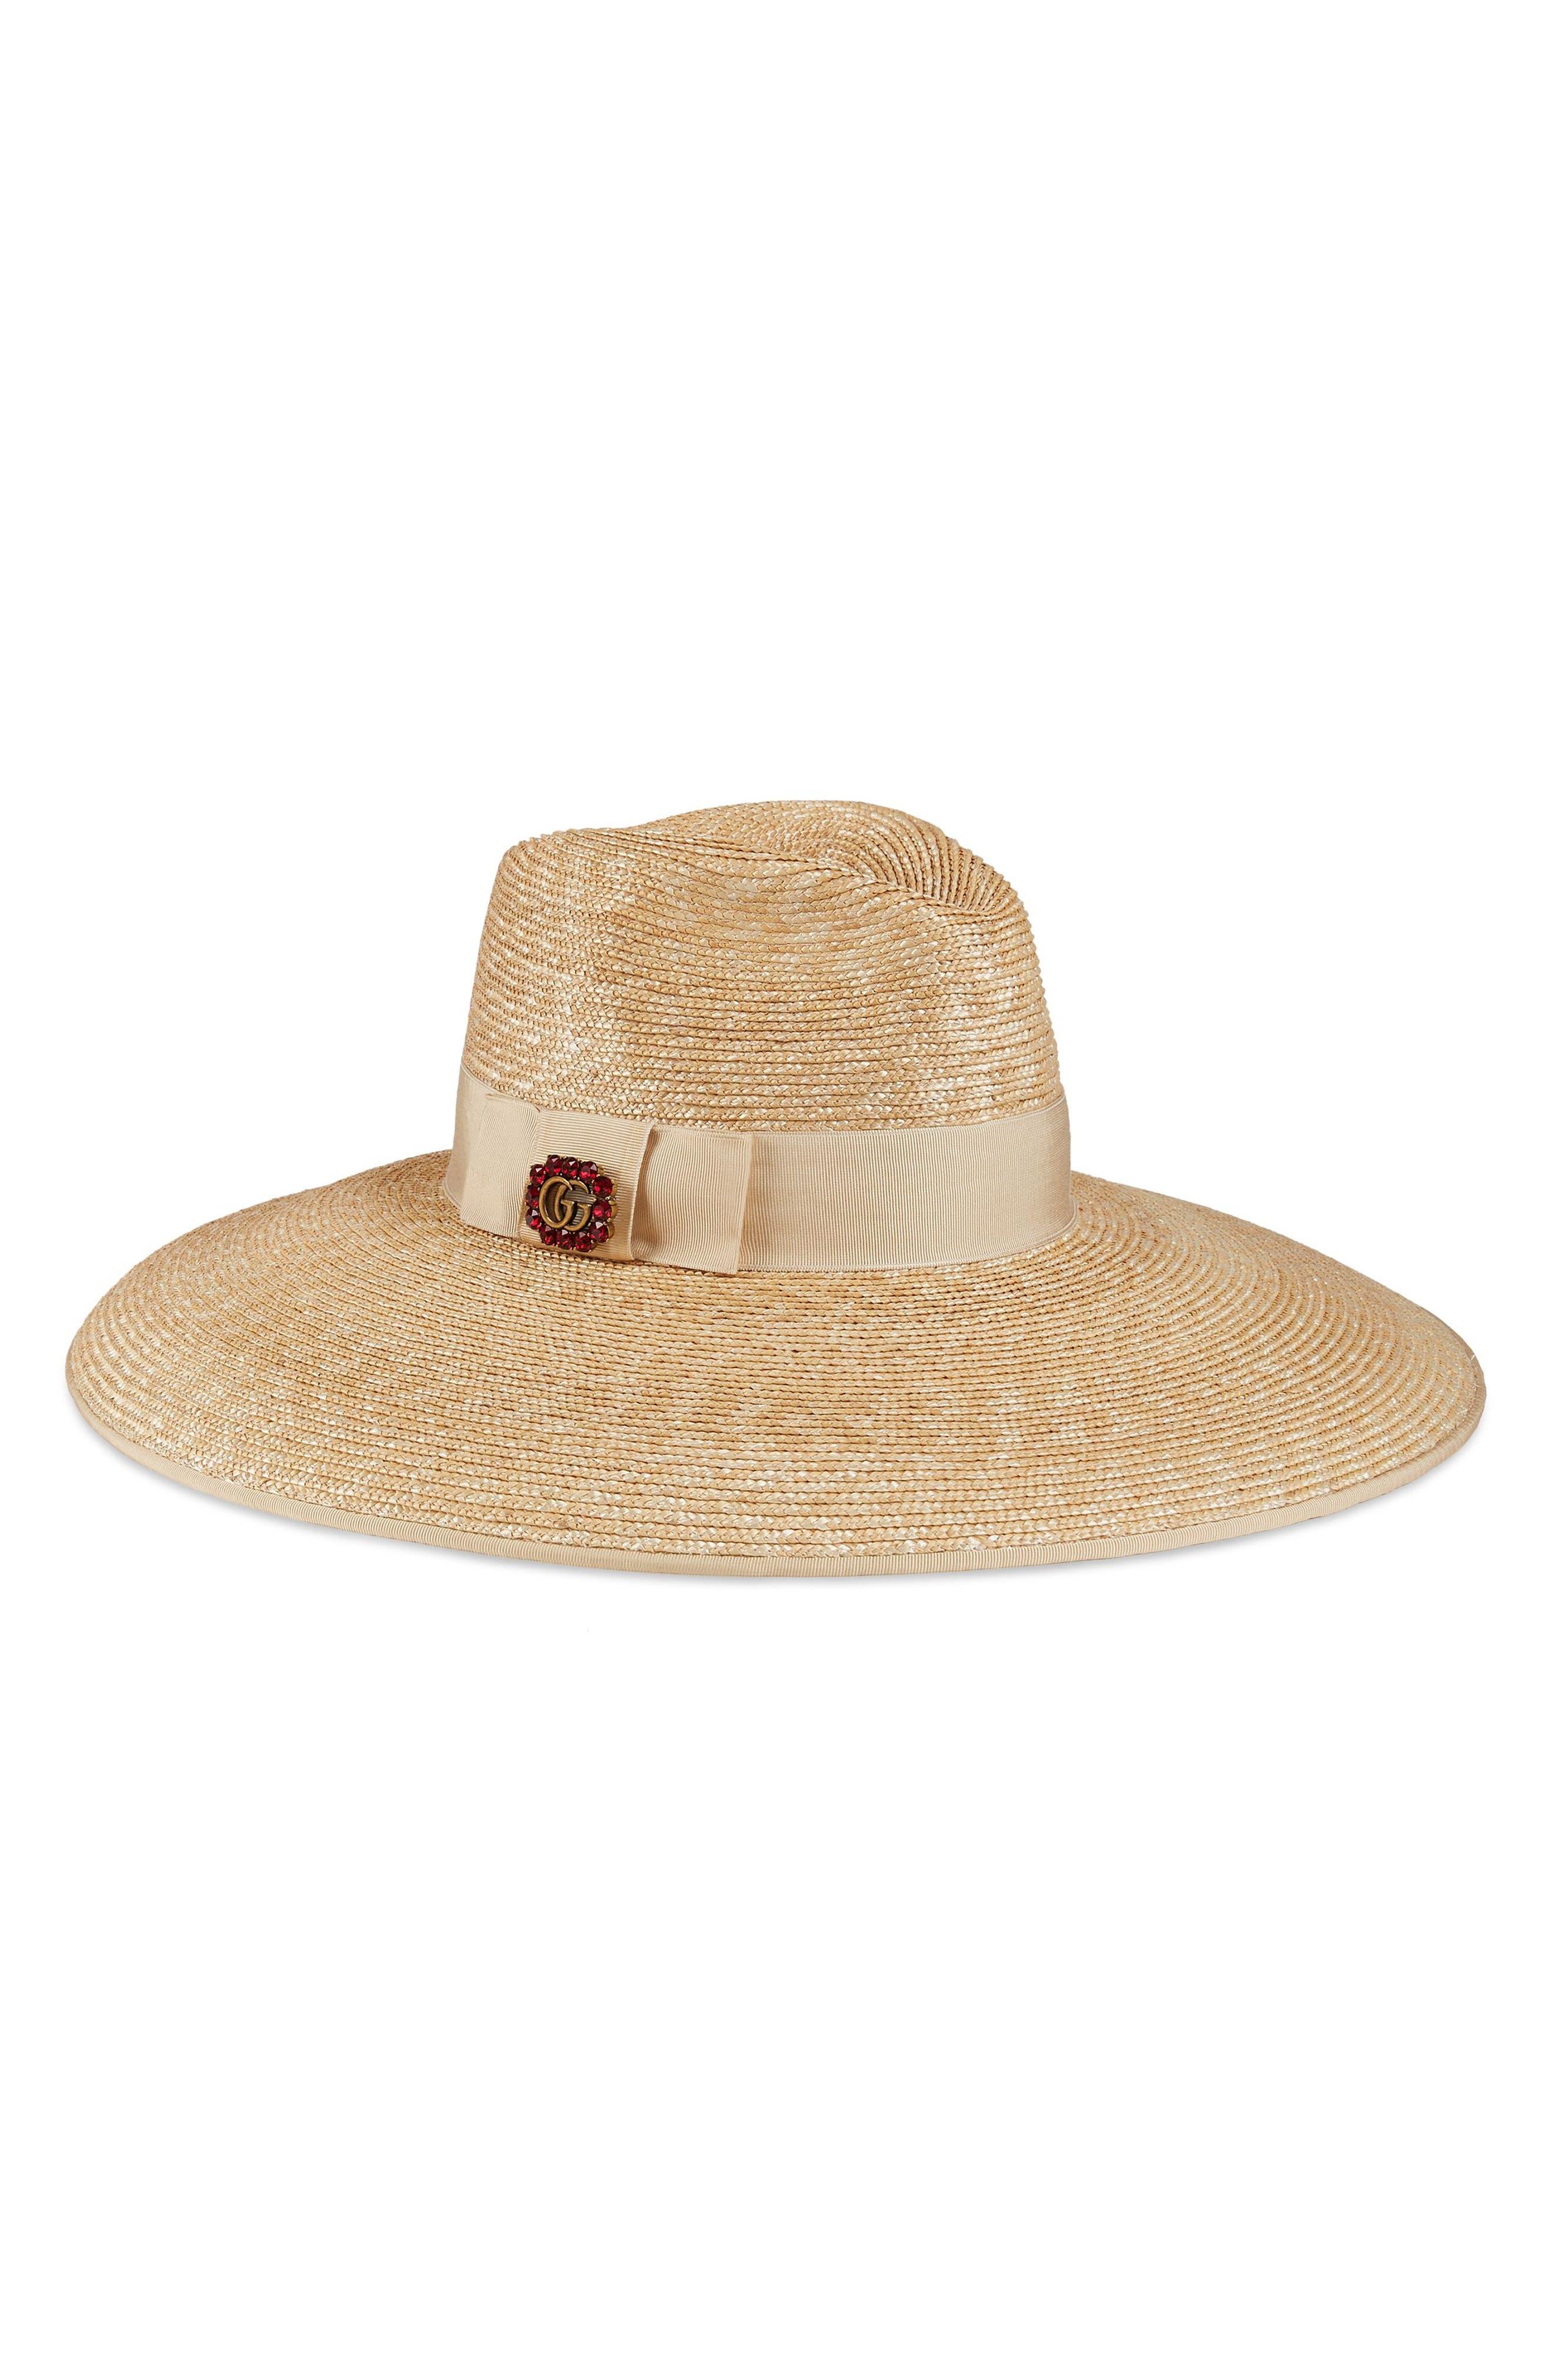 Crystal Embellished Wide Brim Straw Hat,                             Main thumbnail 1, color,                             110